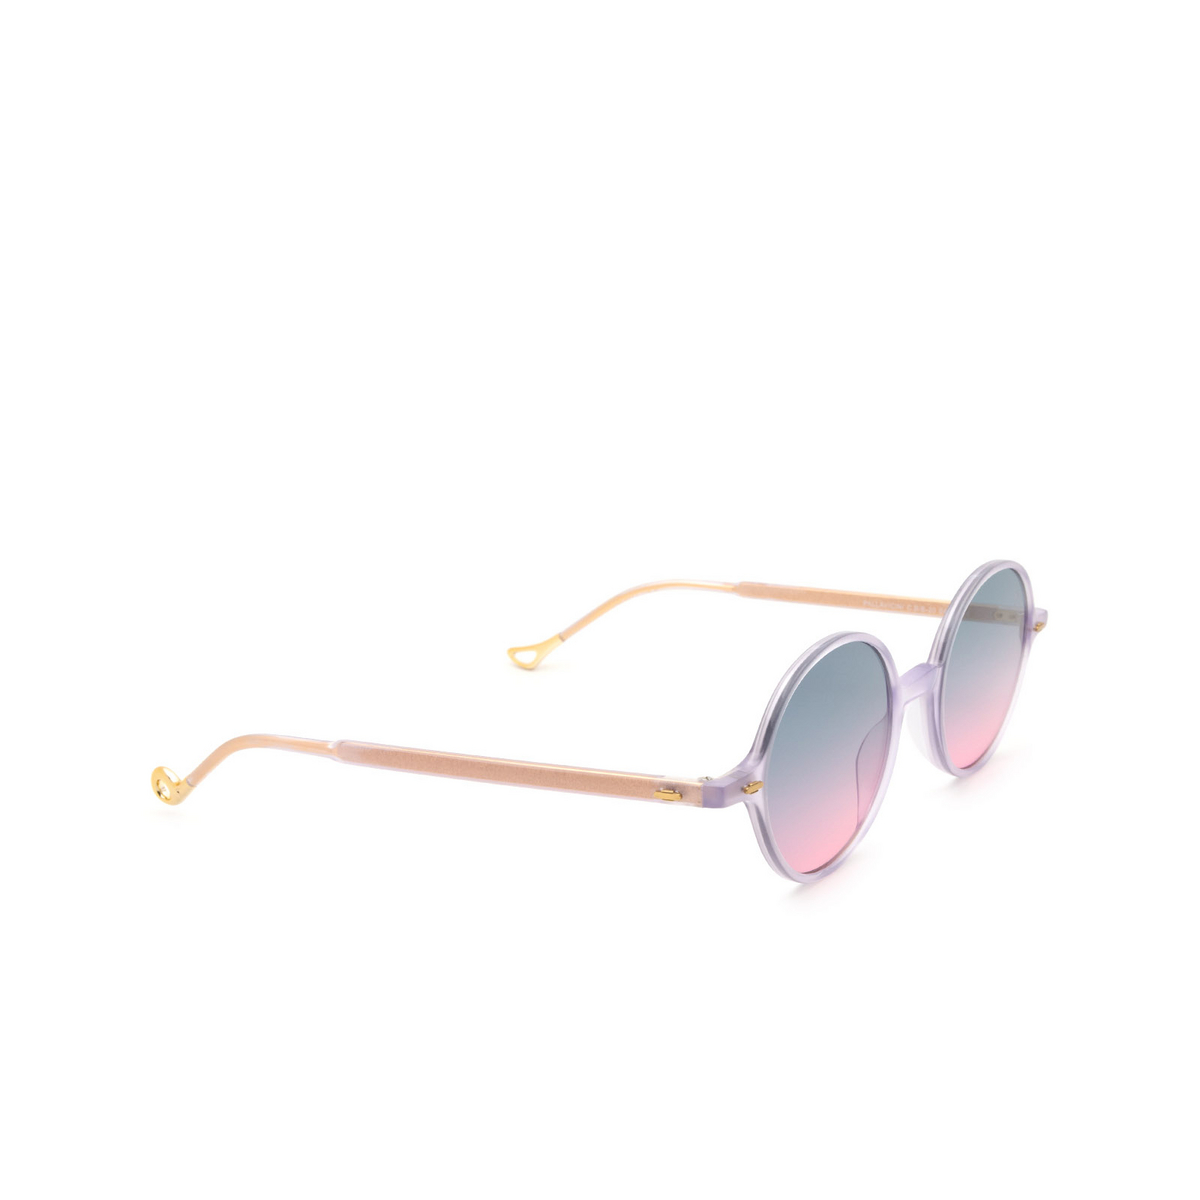 Eyepetizer® Round Sunglasses: Pallavicini color Lilac C.B/B-20 - three-quarters view.